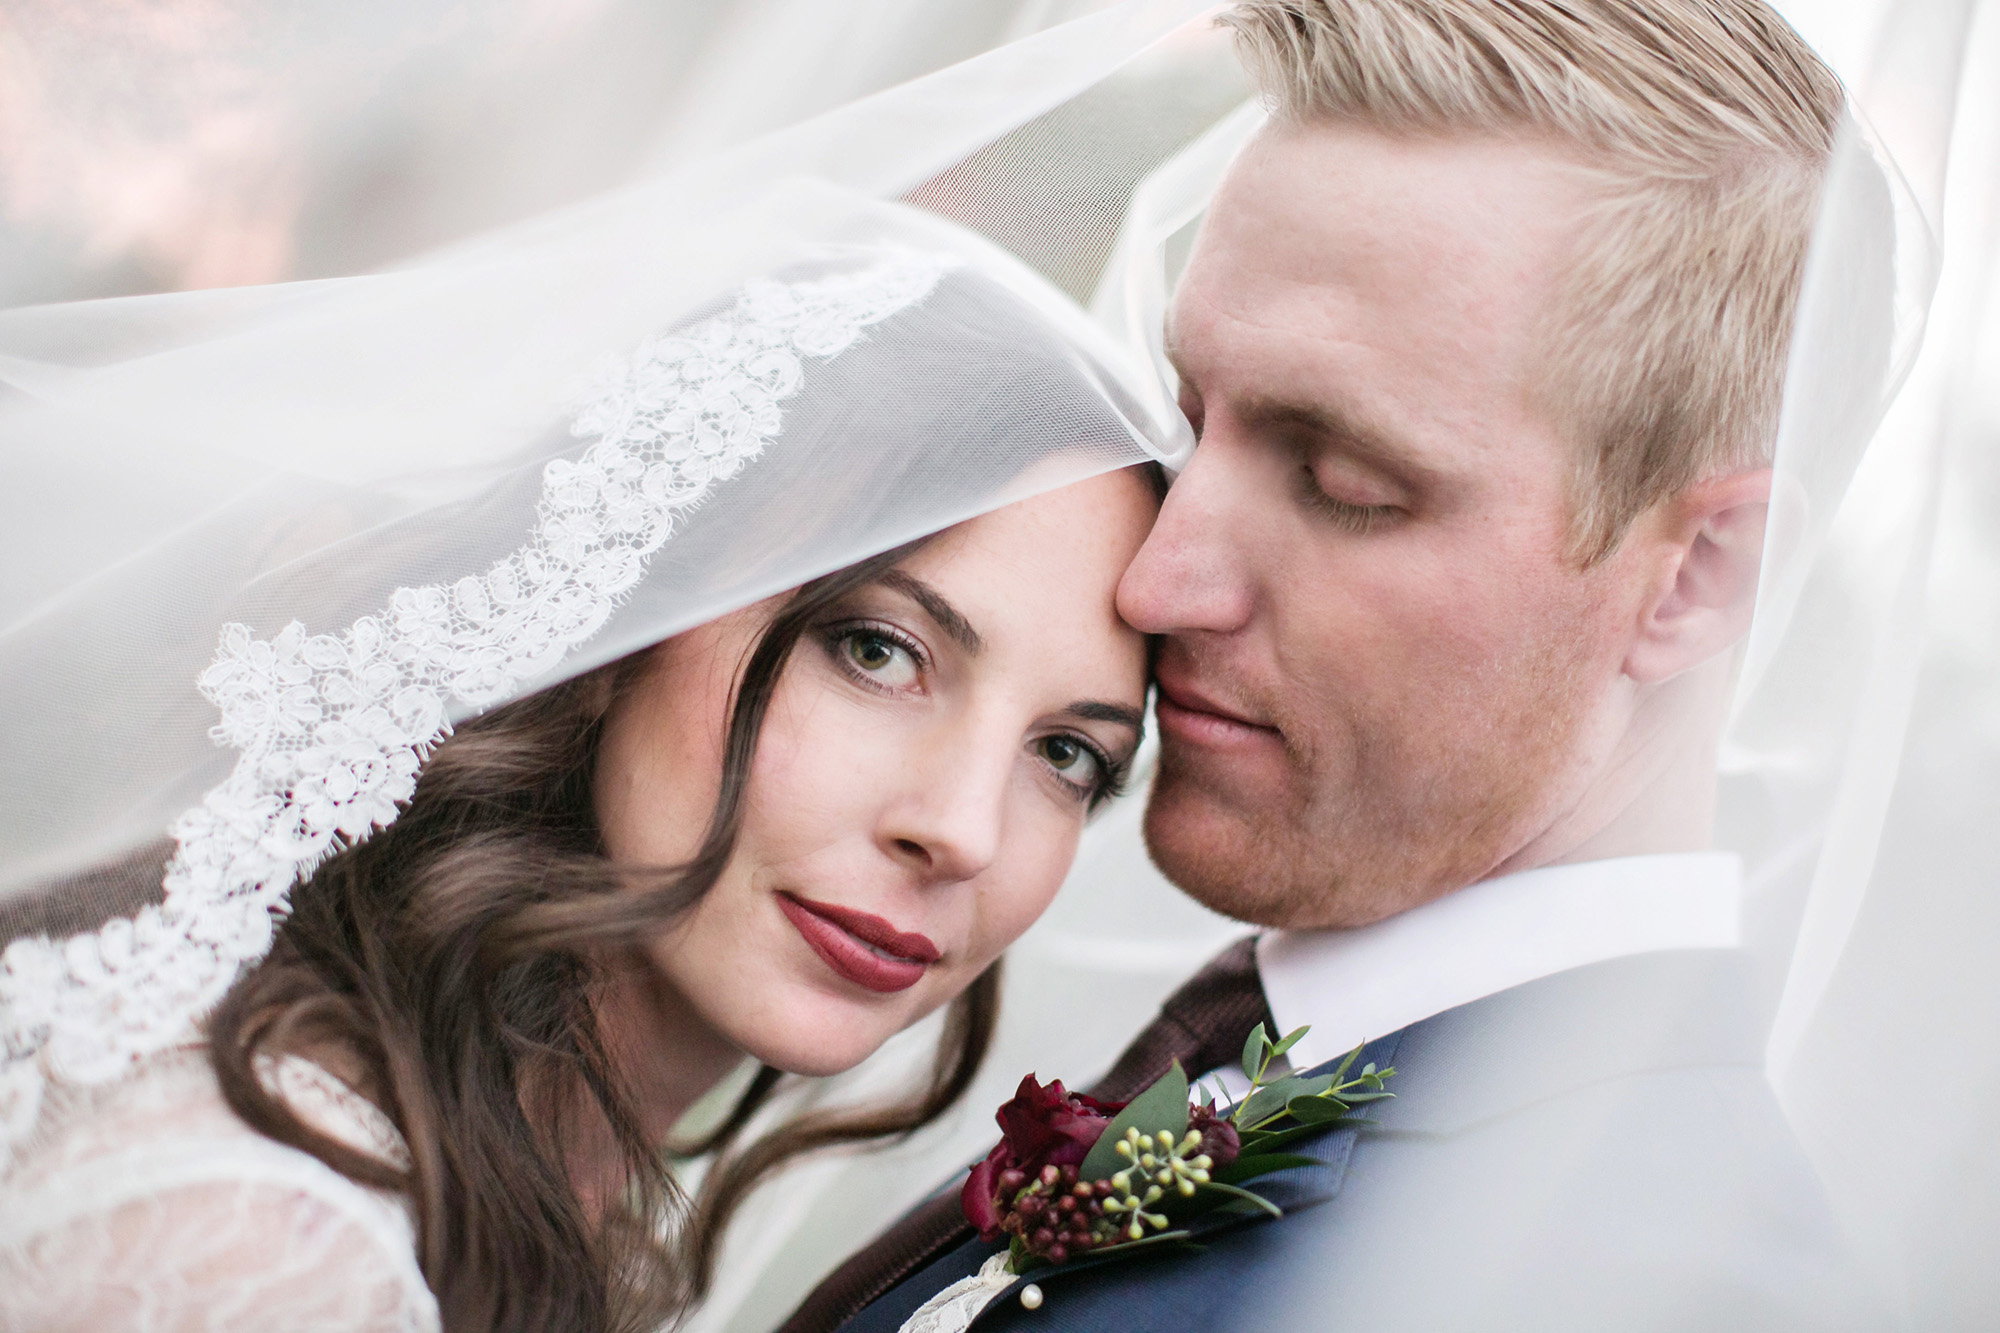 christmas-house-weddings-receptions-carrie-vines-131.jpg